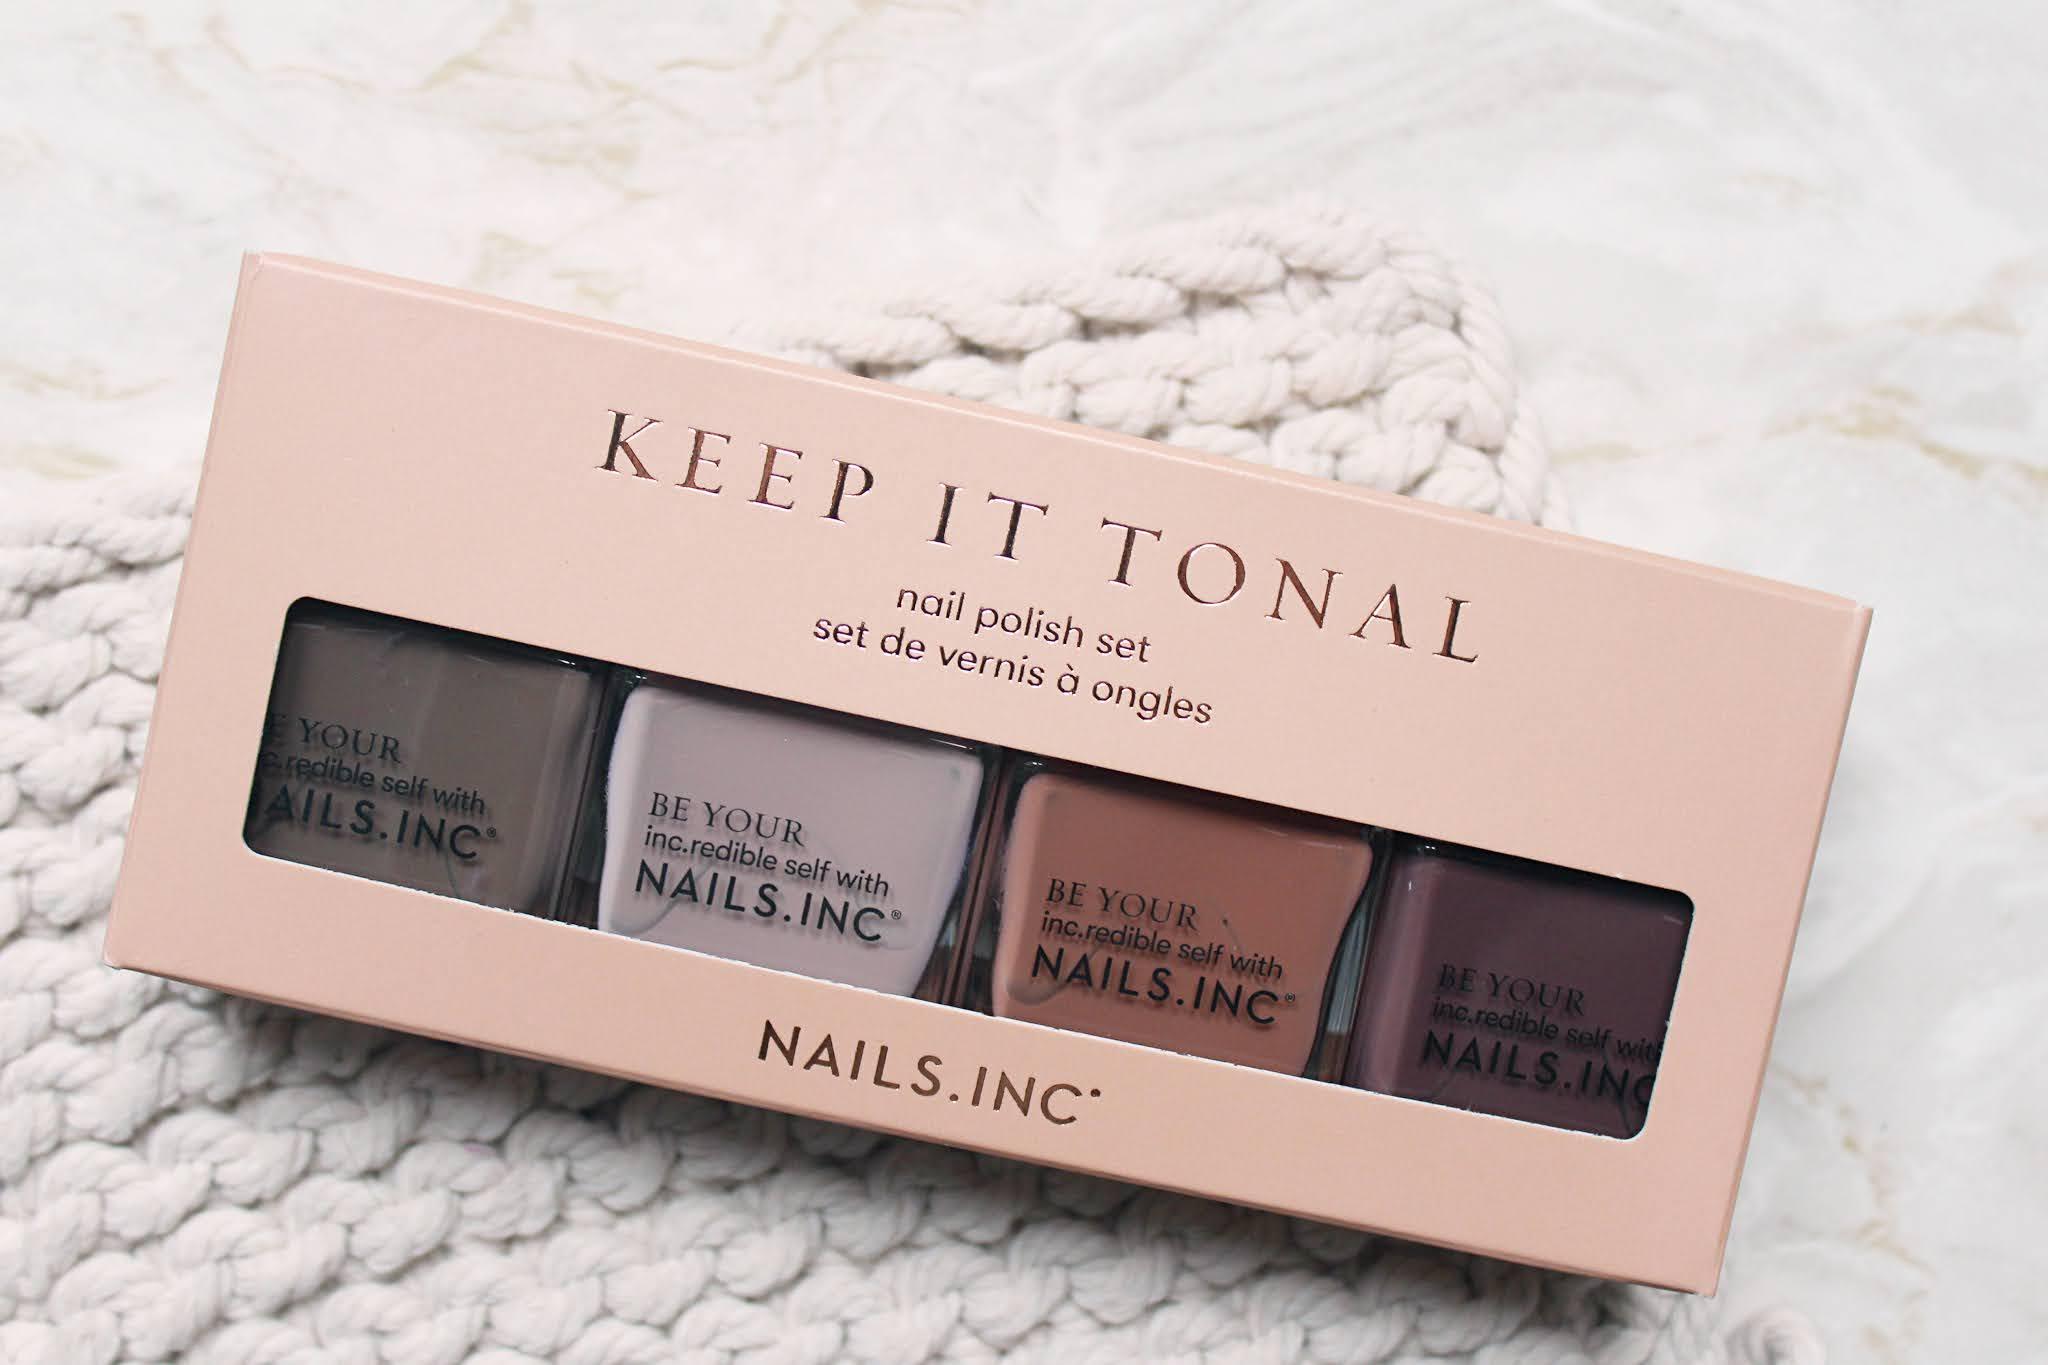 Nails Inc Keep It Tonal Ombre Nail Polish Set Review & Swatches